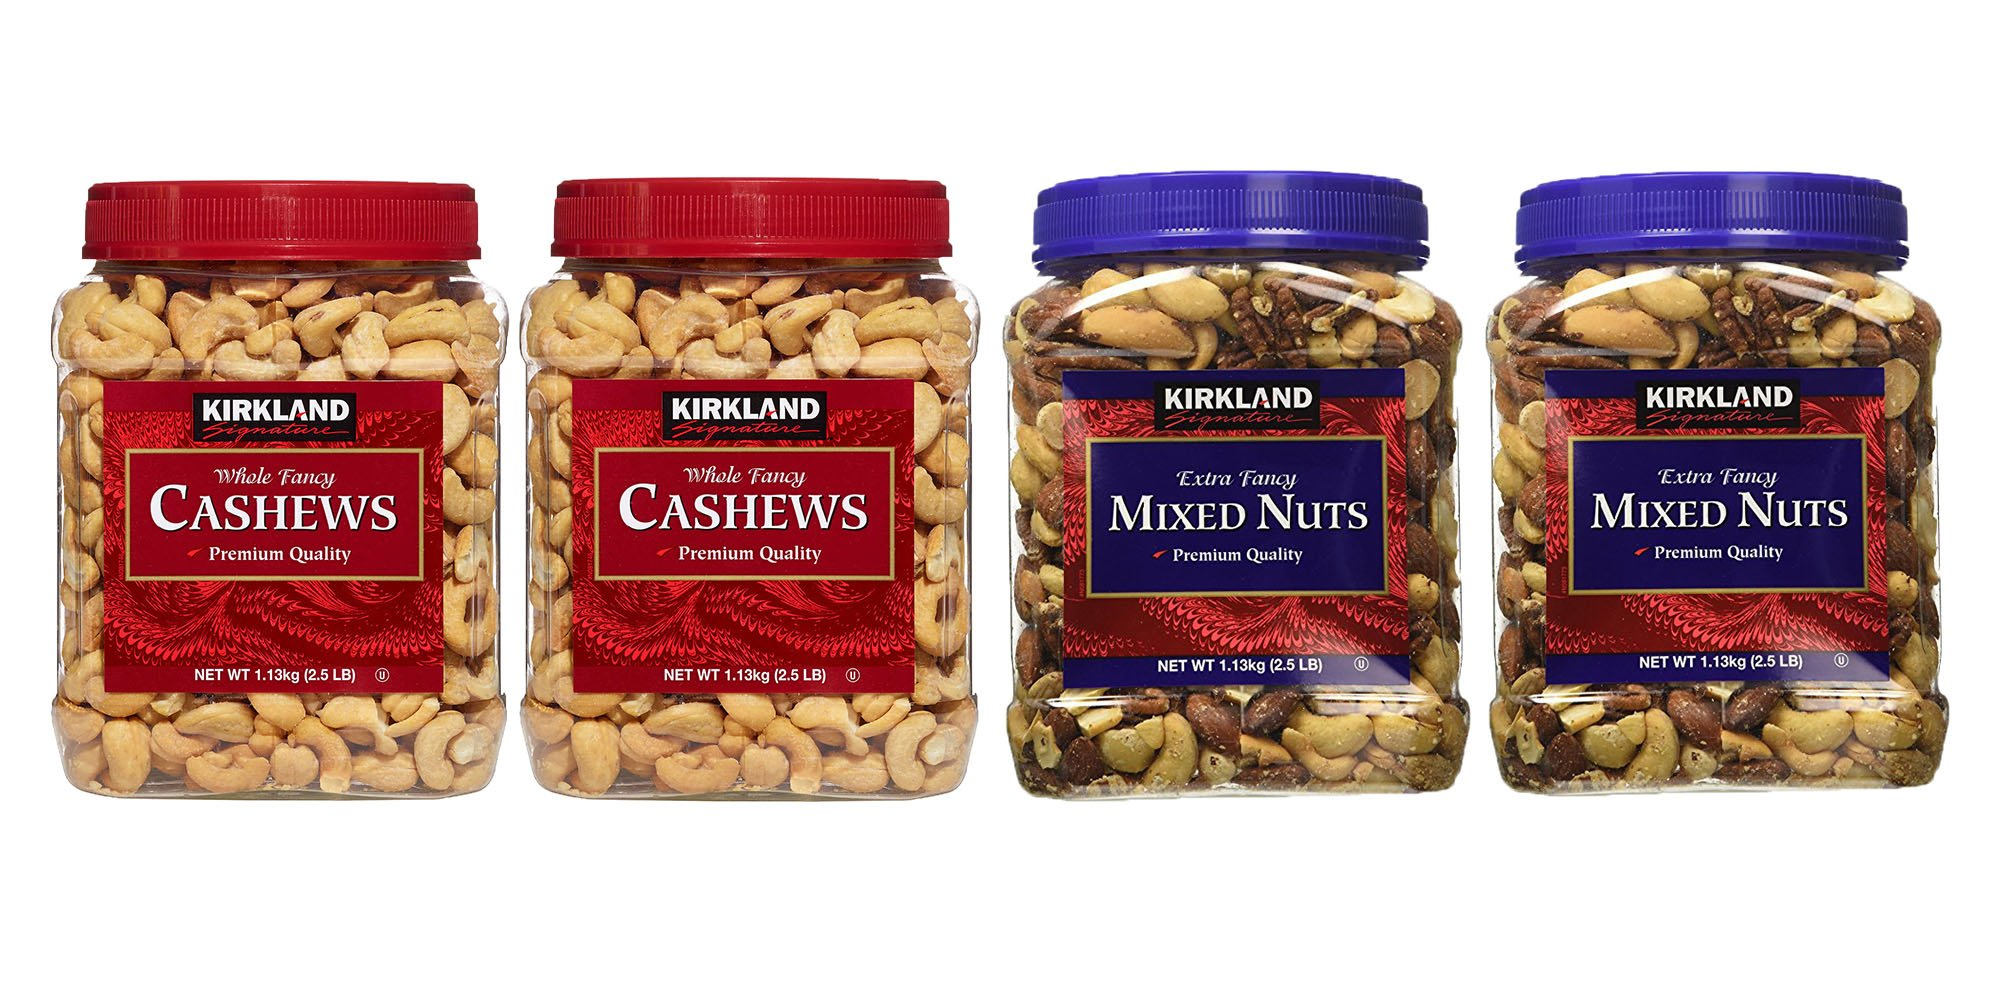 Kirkland Signature Cashews and Mixed Nuts Bundle - Includes Kirkland Signature's Two Whole Fancy Cashews (2.5 LB each) and Two Extra Fancy Mixed Nuts (2.5 LB each)